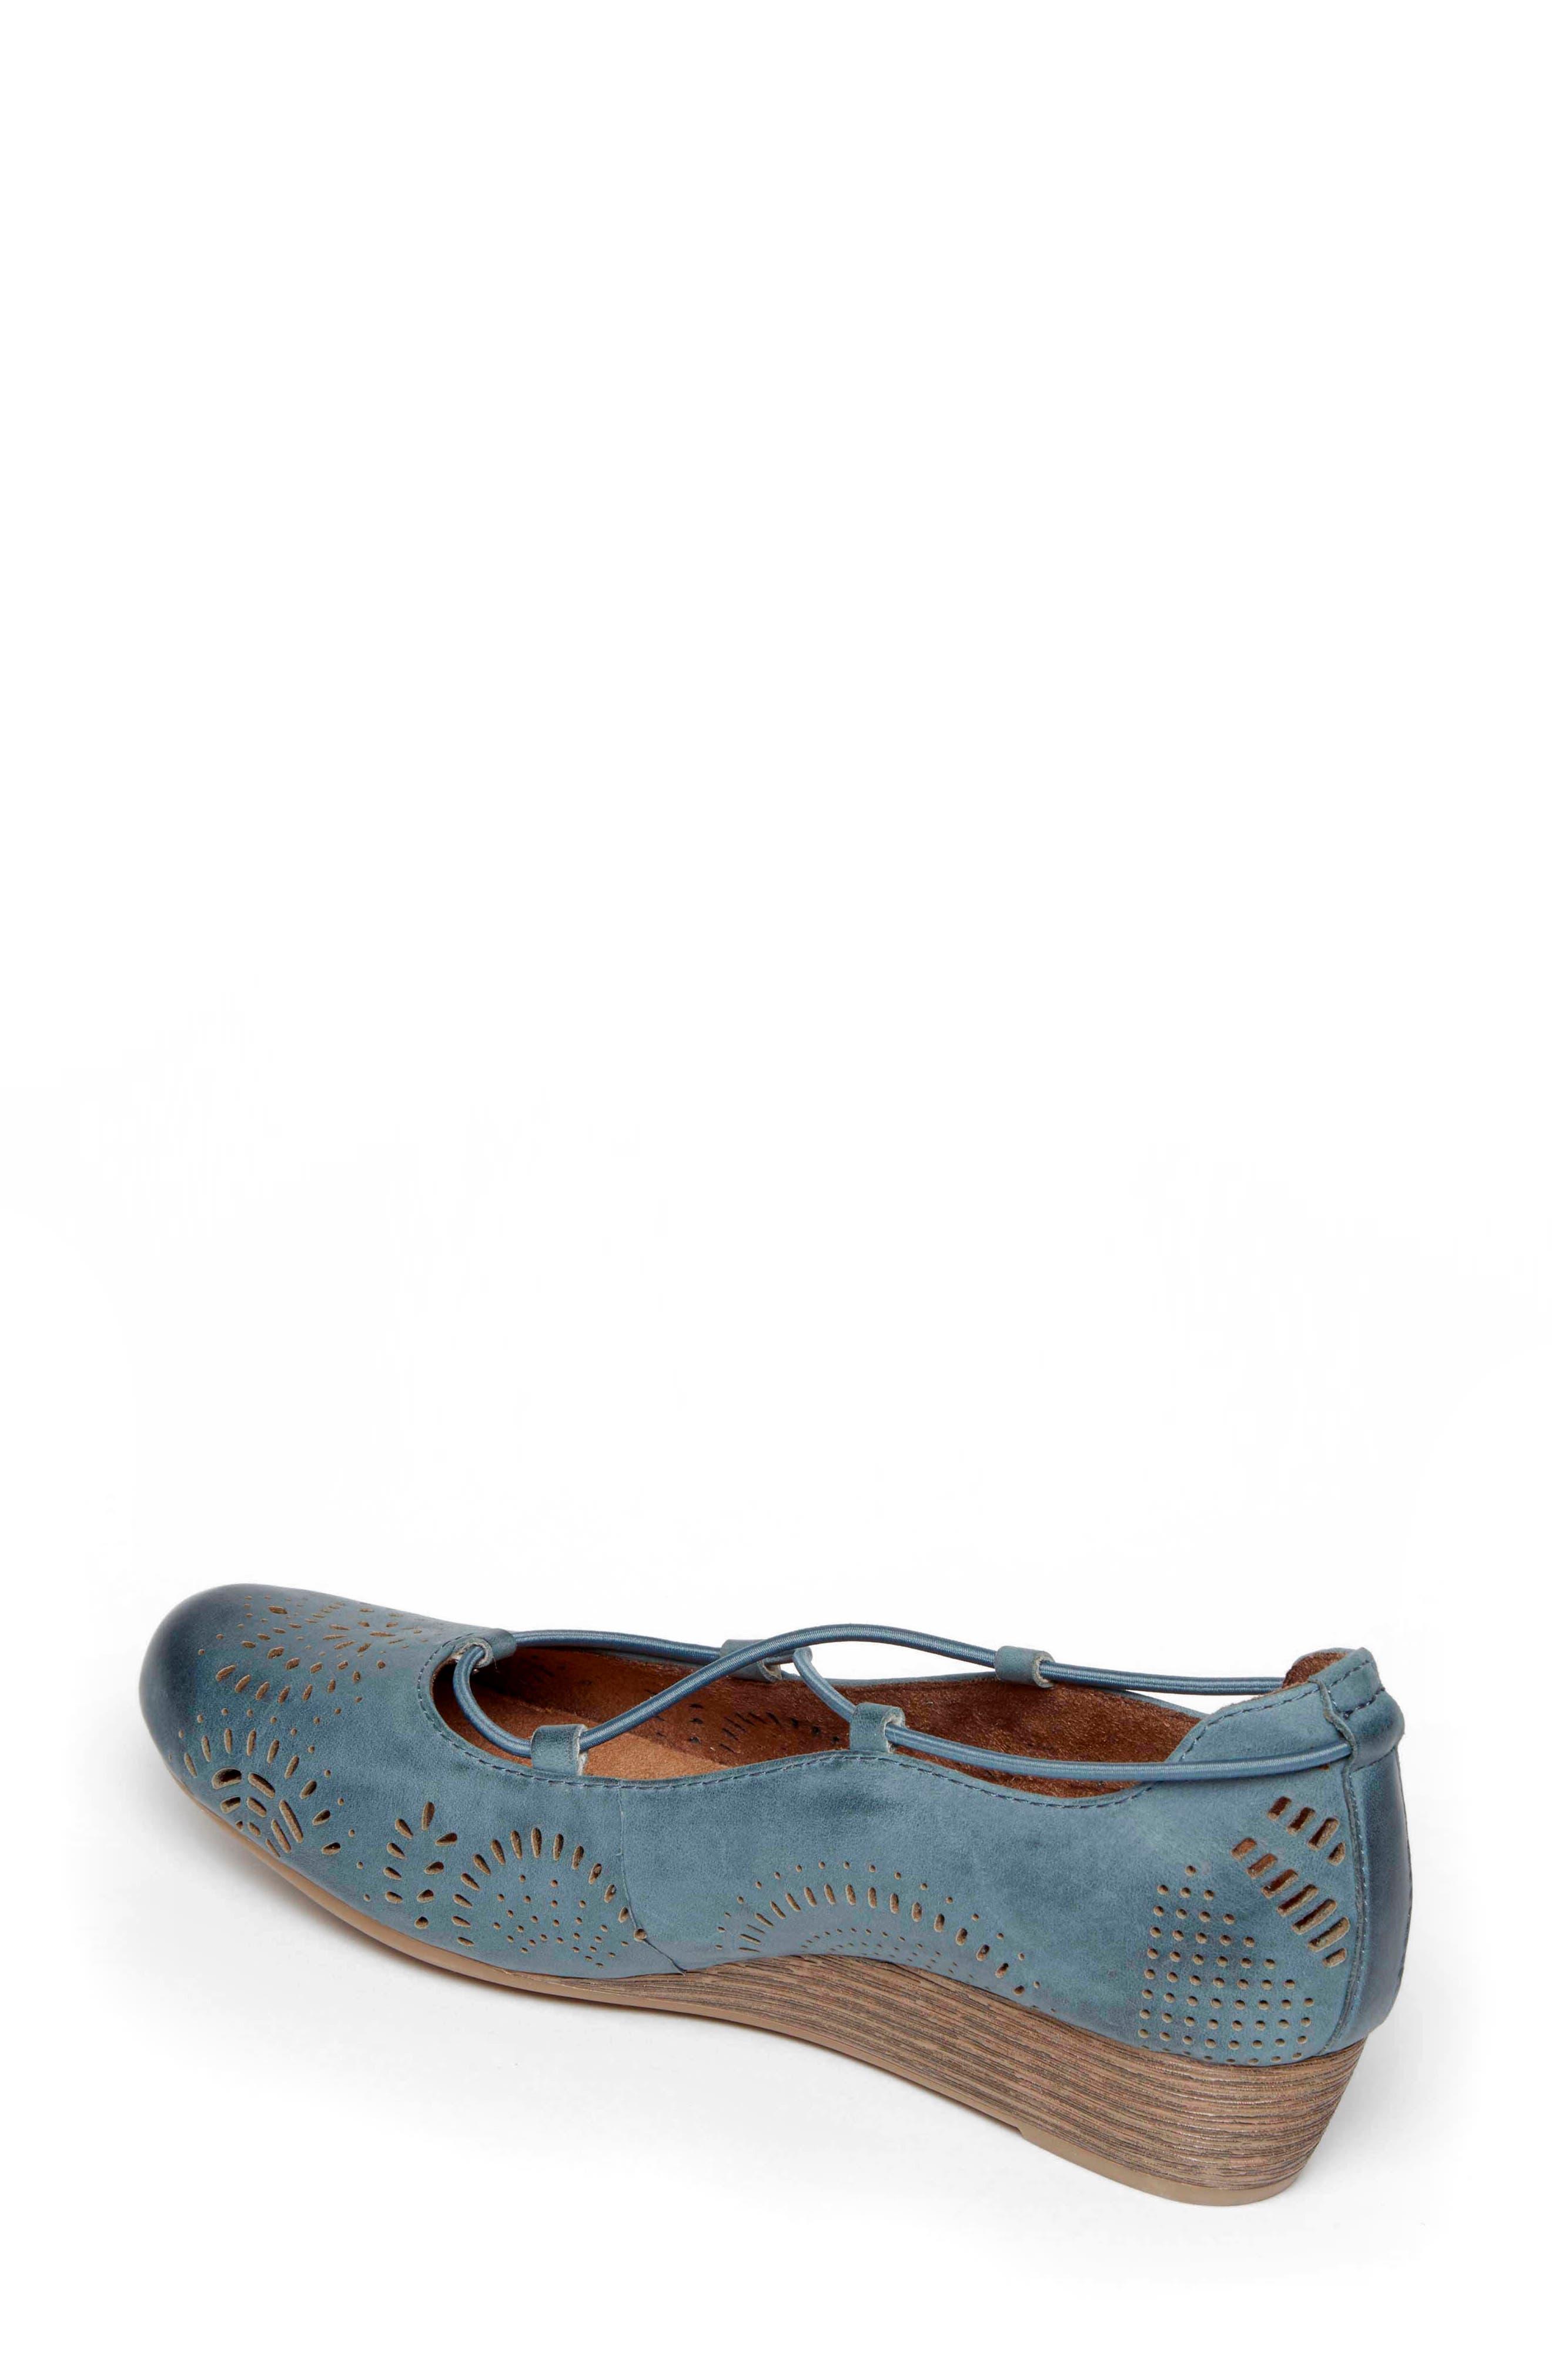 Janna Cross Strap Wedge Sandal,                             Alternate thumbnail 10, color,